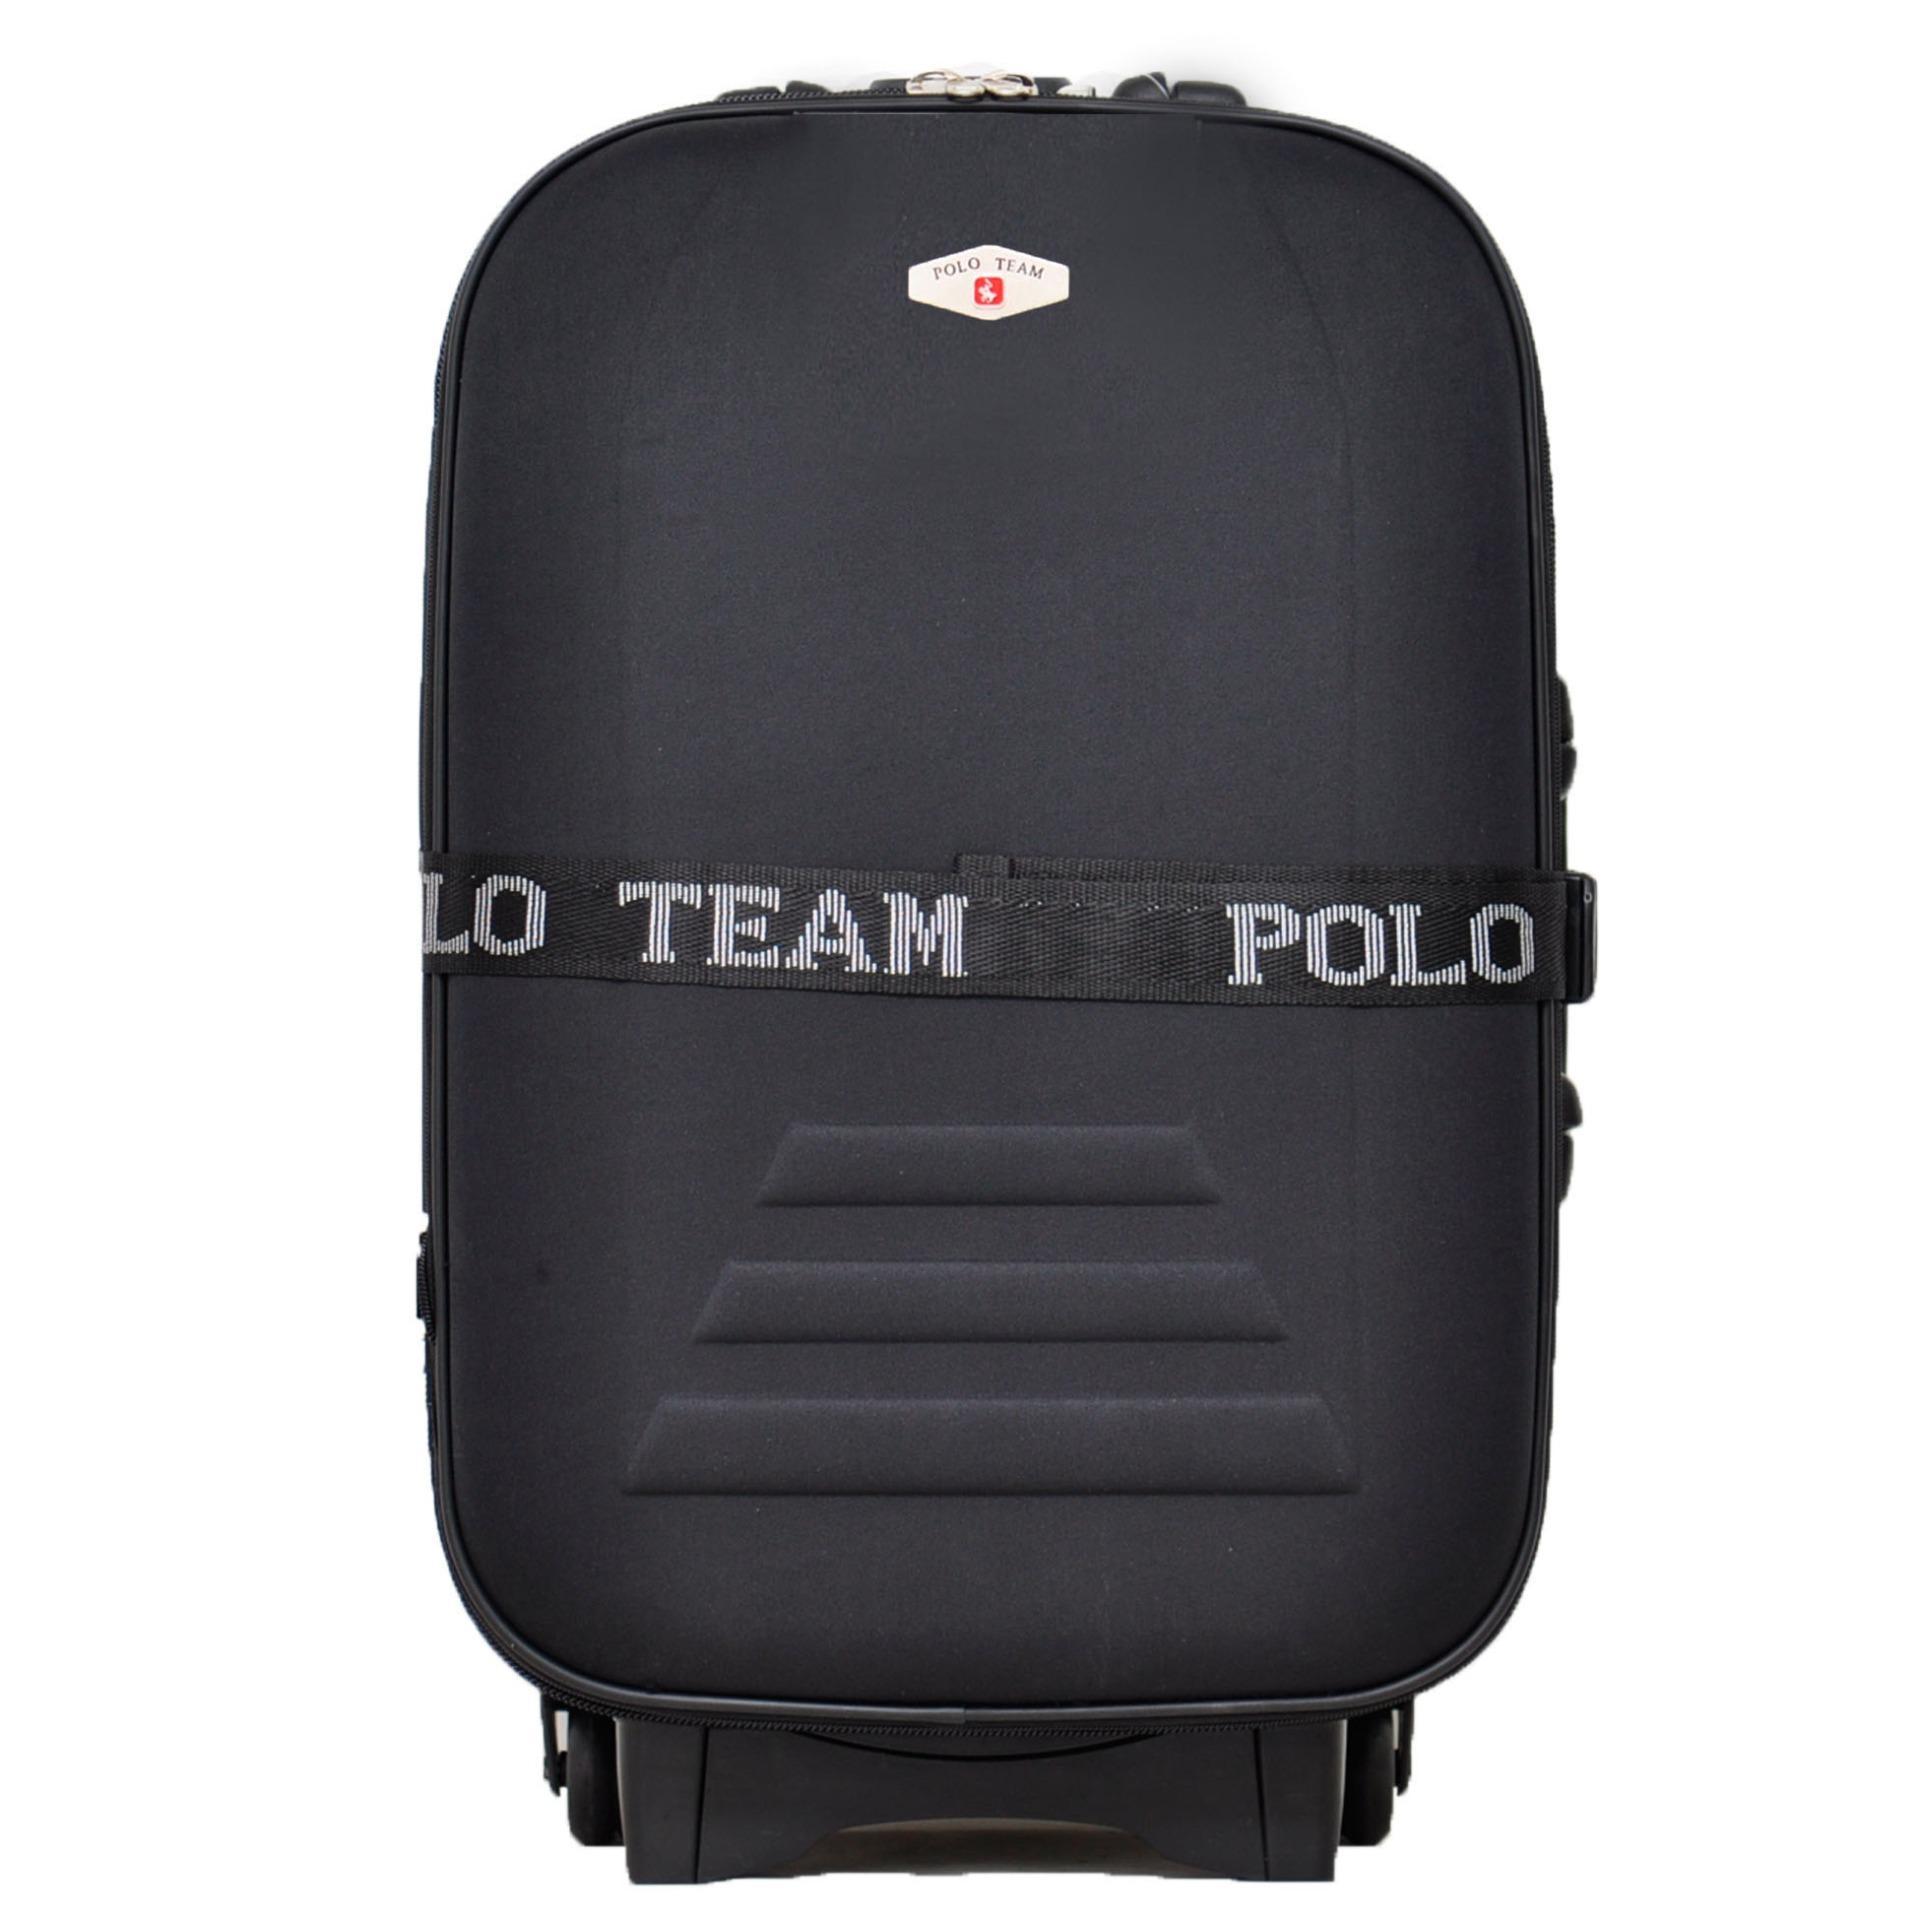 Jual Polo Team 967 Koper Kabin Size 20 Inch Gratis Pengiriman Jabodetabek Hitam Polo Team Ori